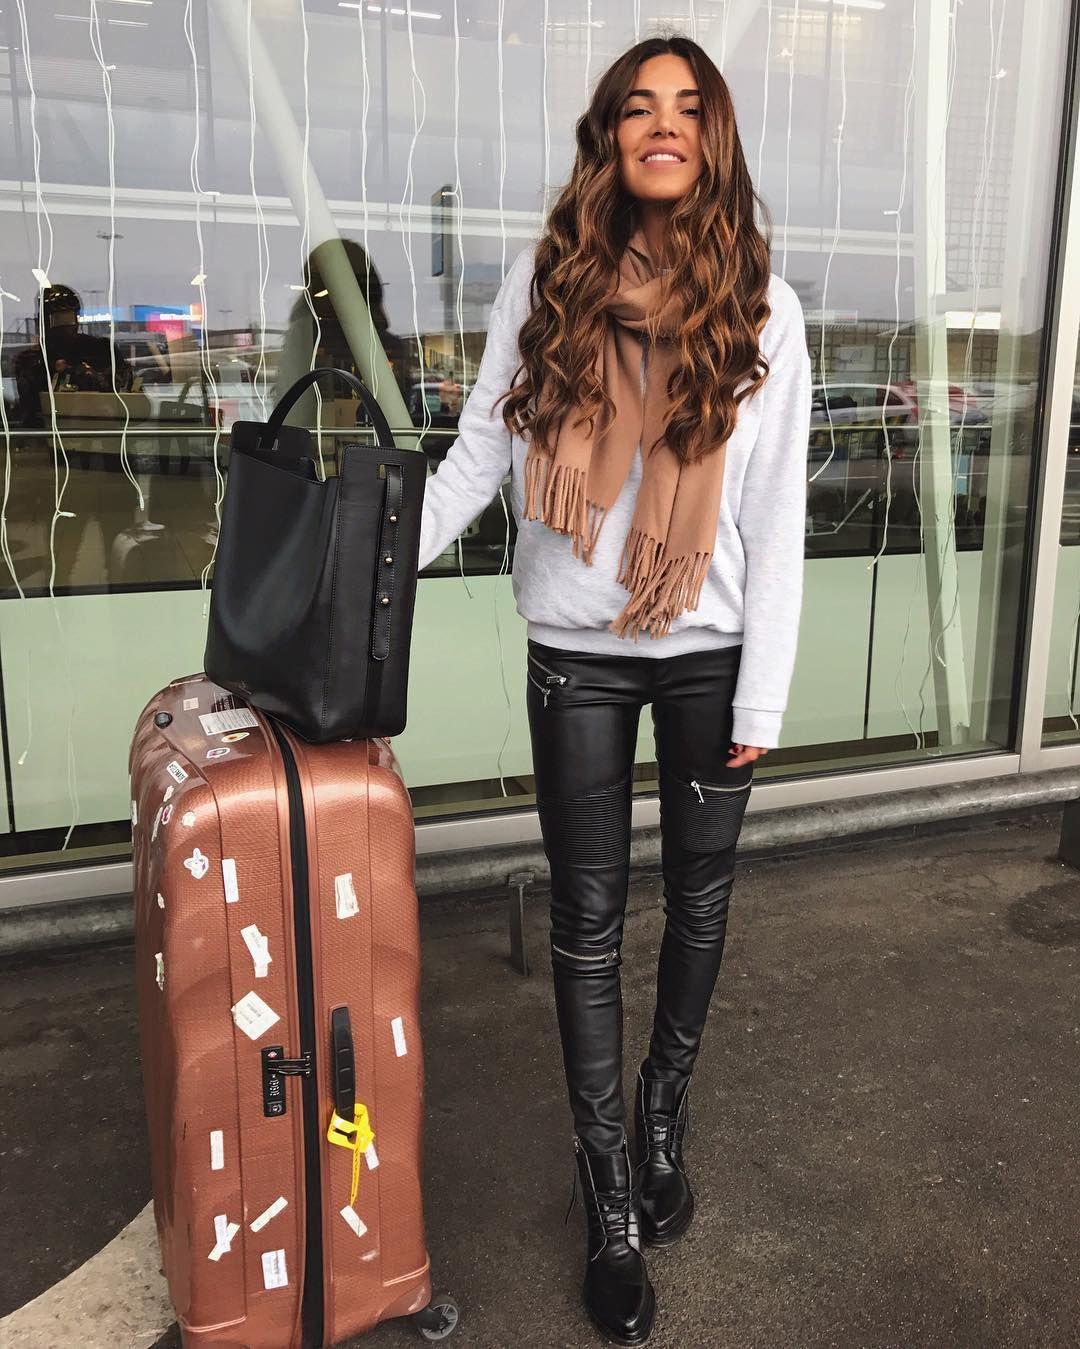 fcd2346f9b38fe Pin by by Jelisaveta on MINIMALIST & SOFTNESS | Fashion, Airport ...